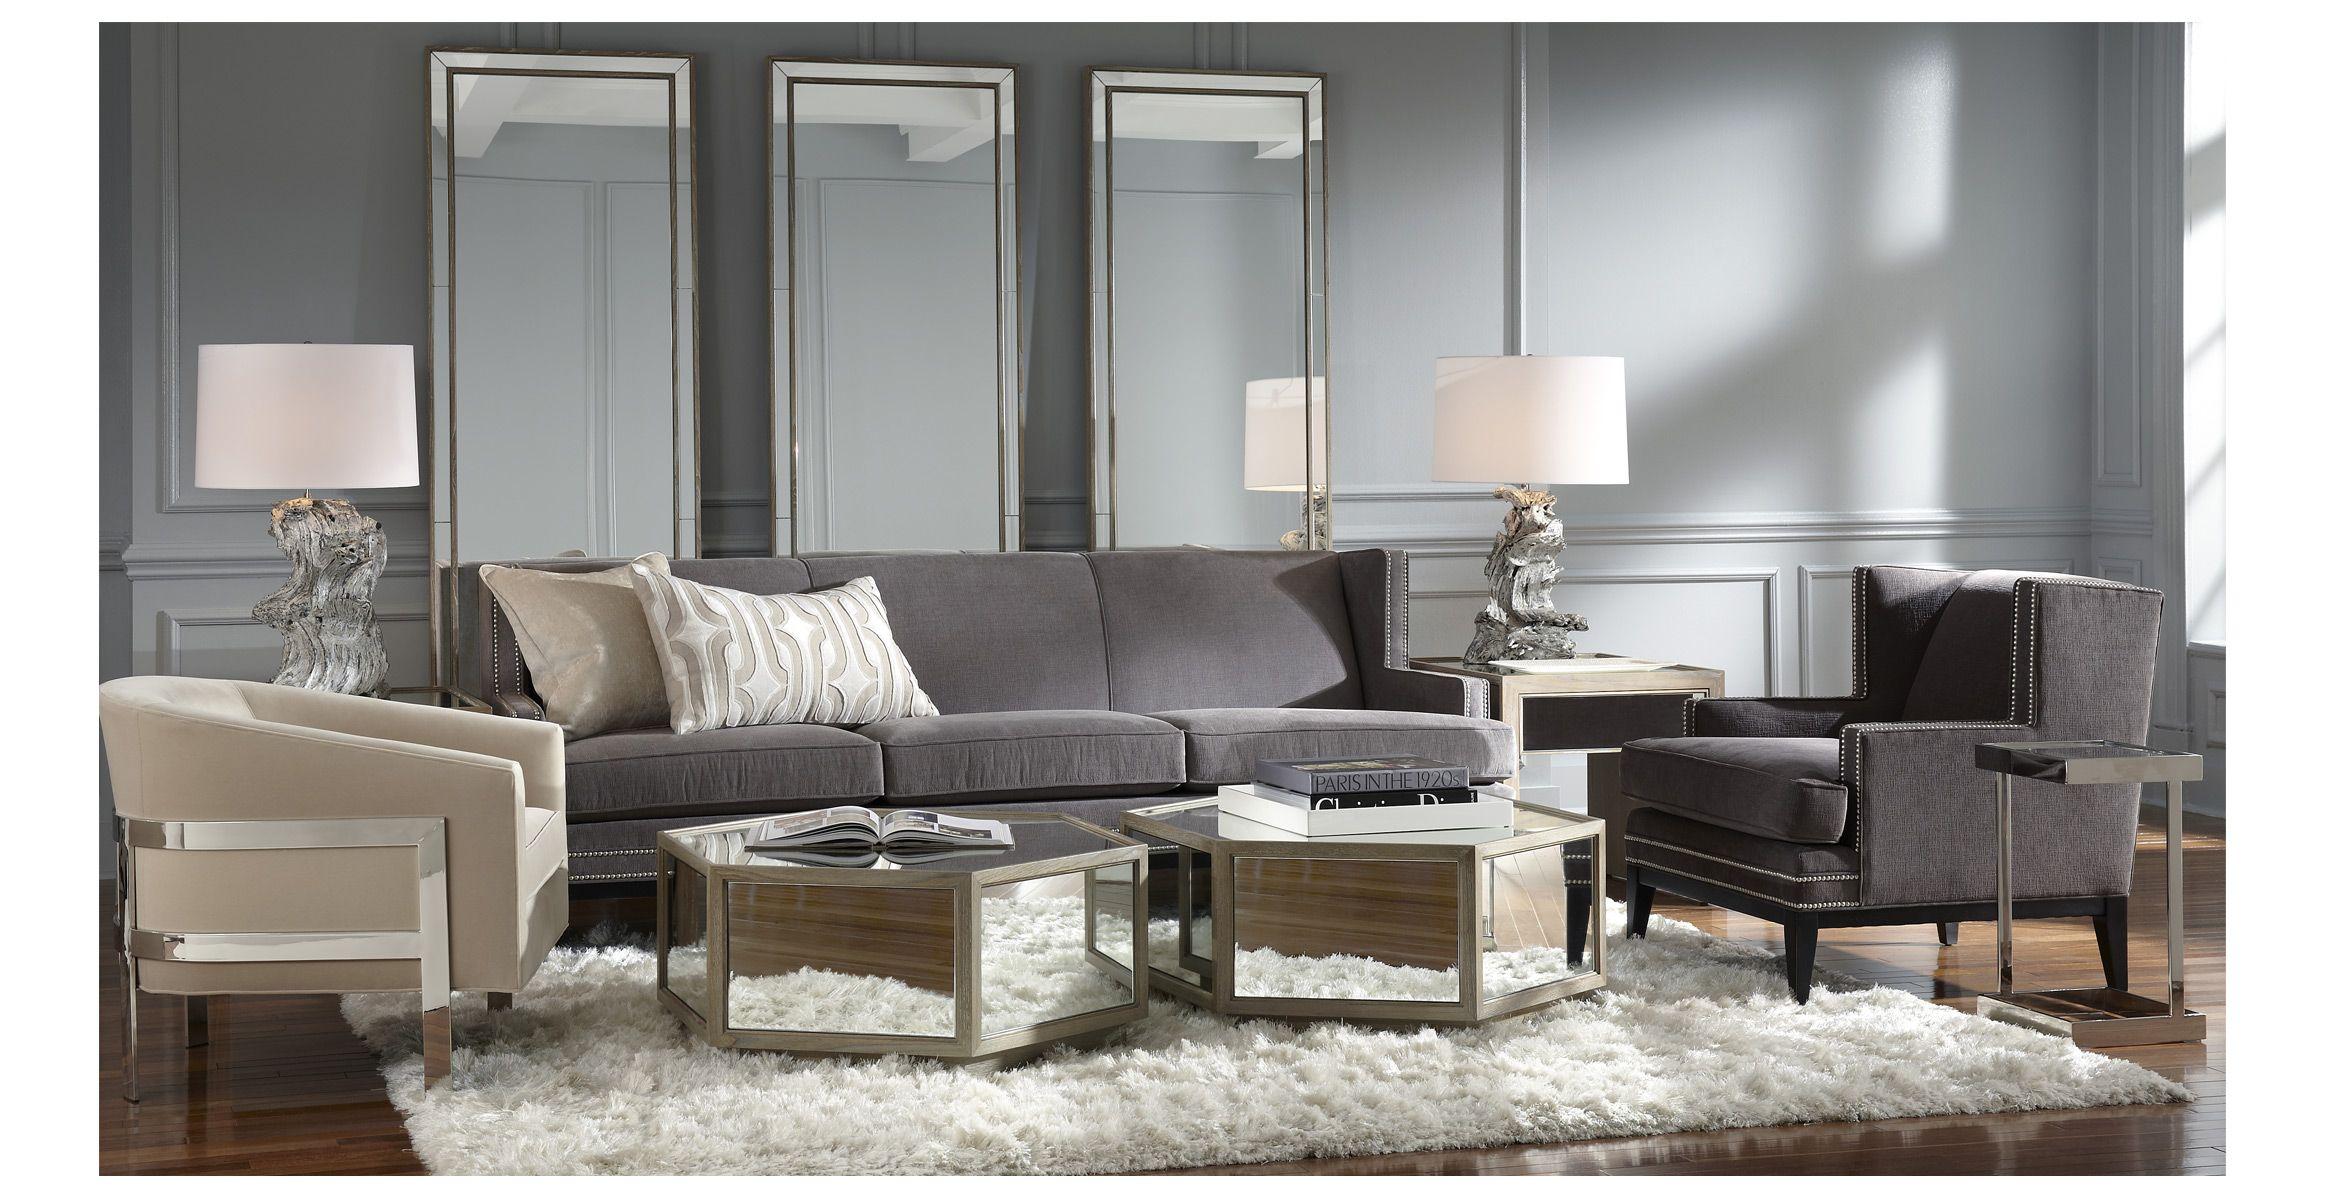 bobs furniture kitchen island laminate flooring for mitchell gold sofa | roselawnlutheran